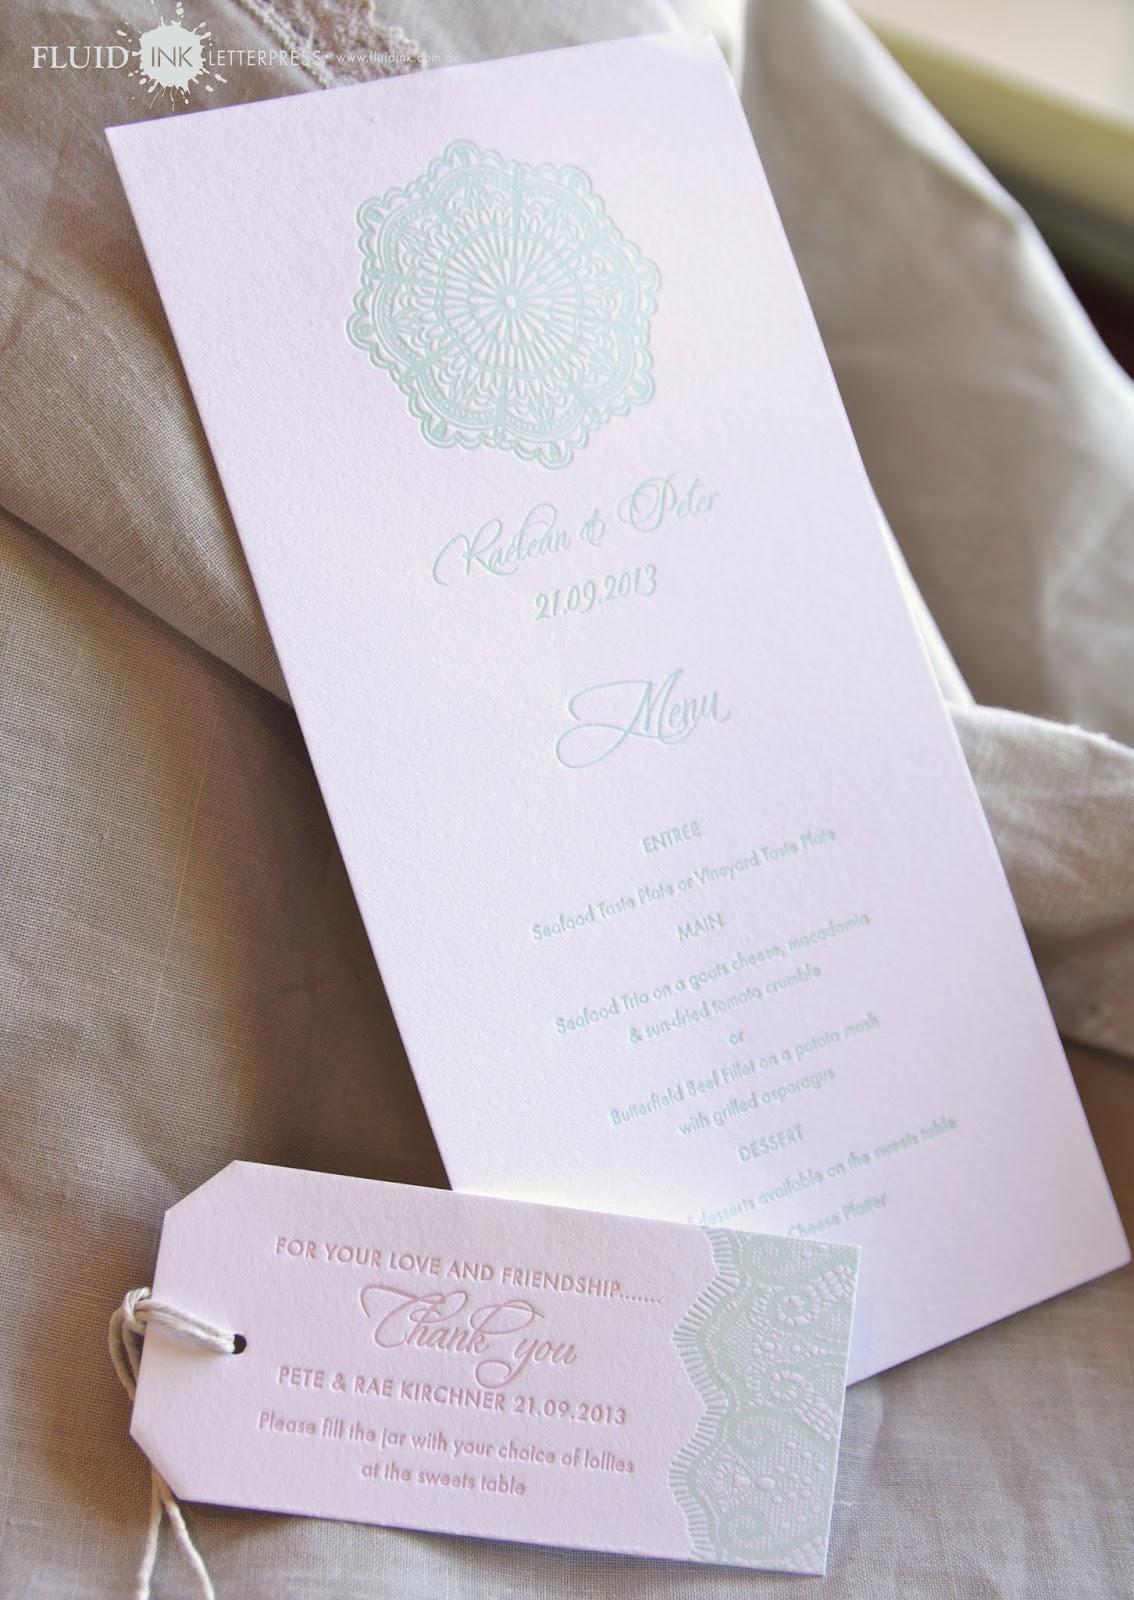 doily wedding invitations australia - 28 images - custom set for ...